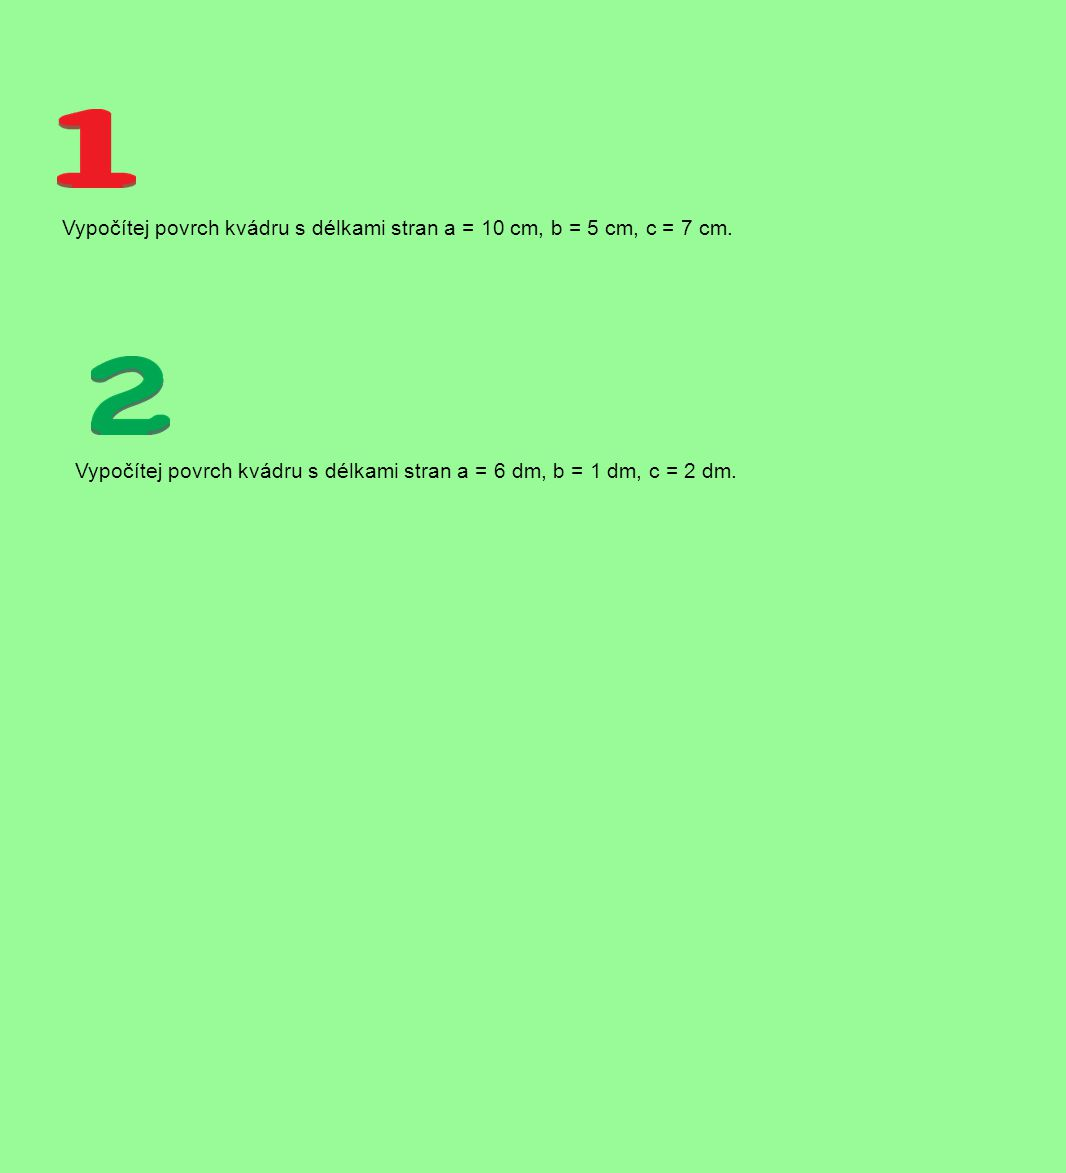 Vypočítej povrch kvádru s délkami stran a = 10 cm, b = 5 cm, c = 7 cm. Vypočítej povrch kvádru s délkami stran a = 6 dm, b = 1 dm, c = 2 dm.